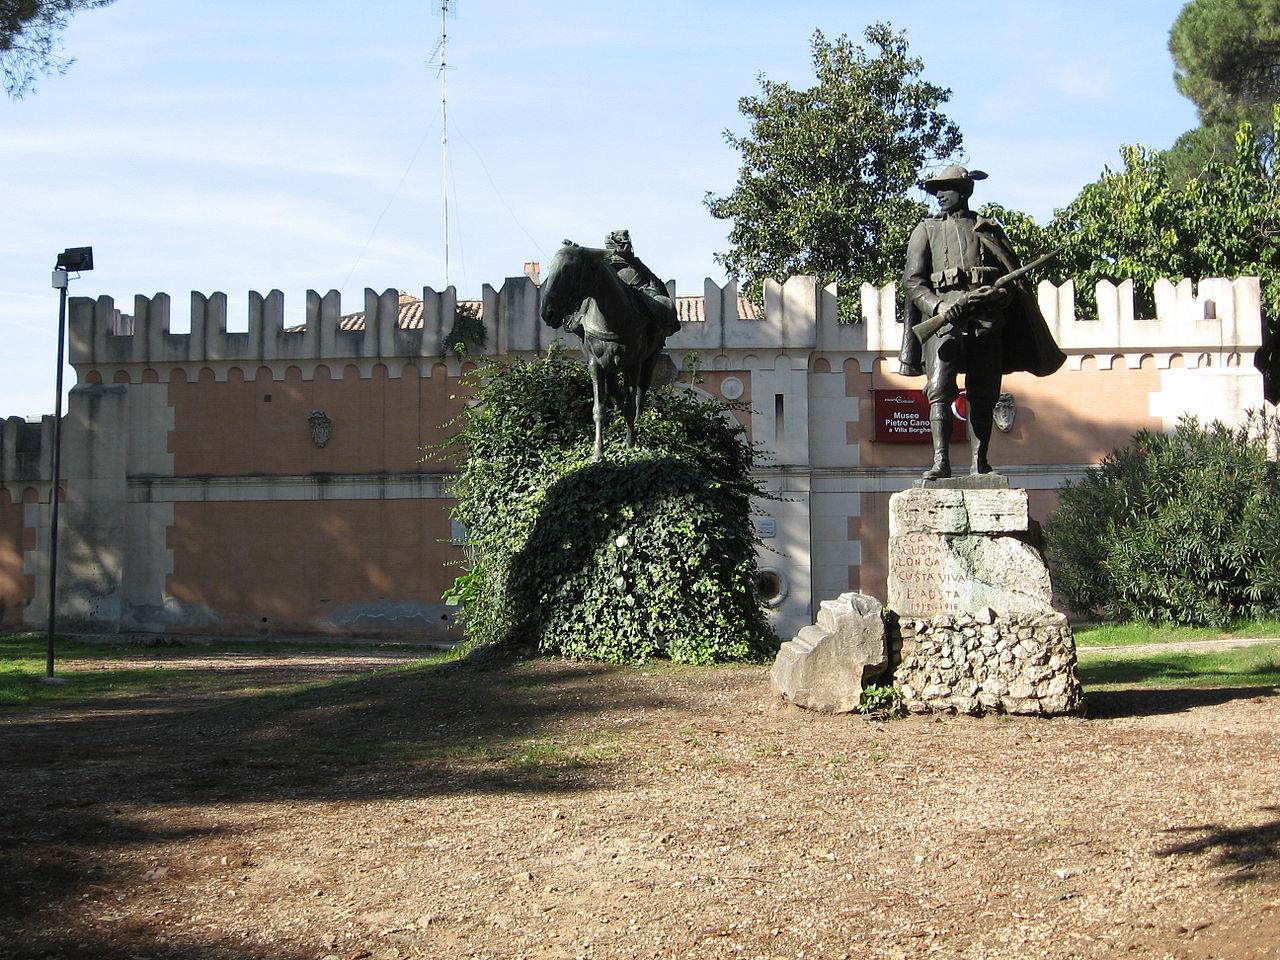 Вилла Боргезе, дом-музей Пьетро Каноника